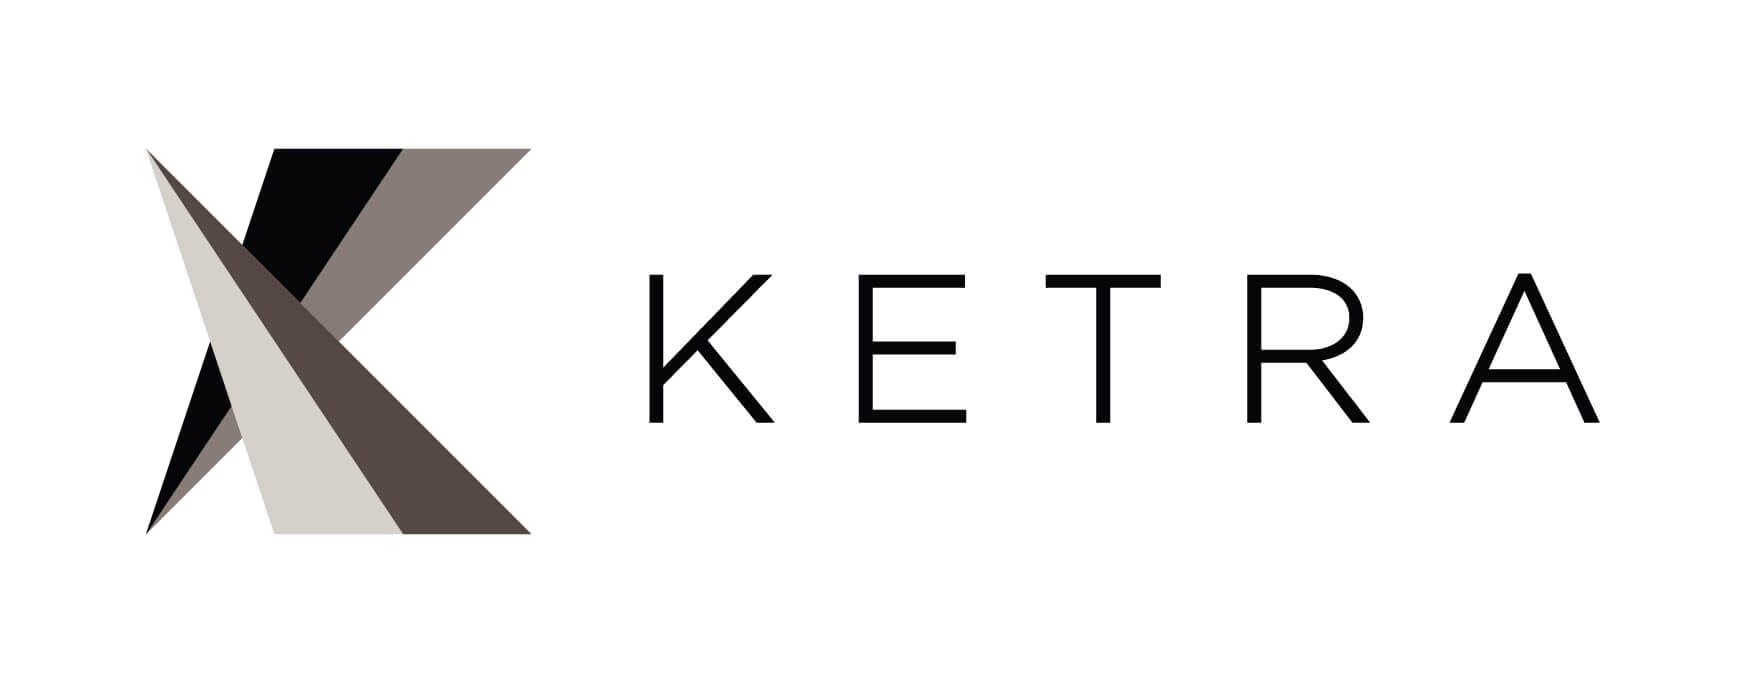 logo ketra linecard ksa Ketra Pelicula at nearapp.co